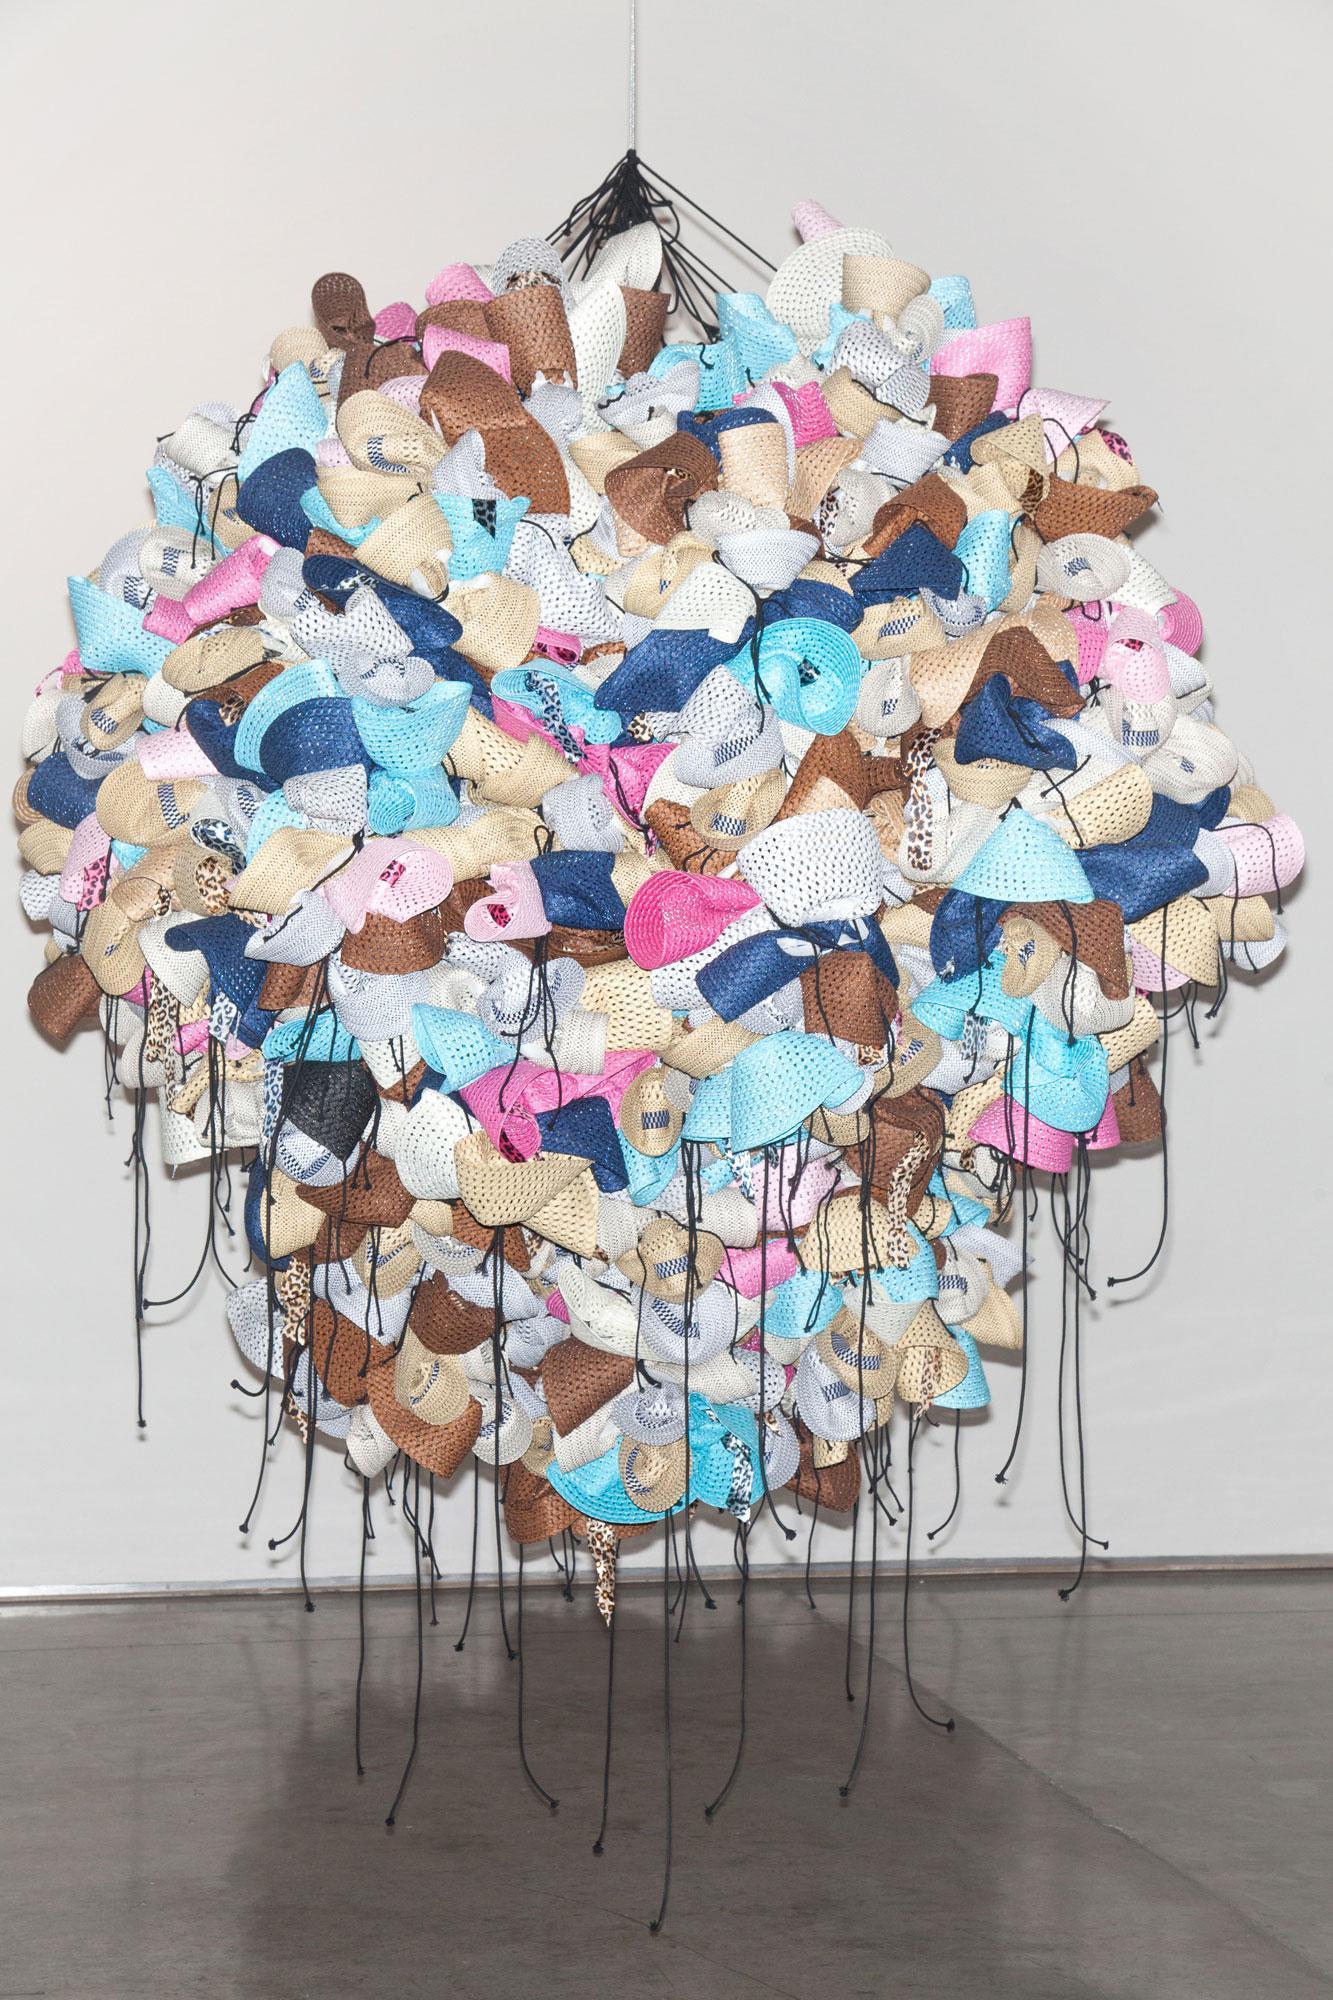 Gallery Isabelle van den Eynde /Hats /byHassan Sharif